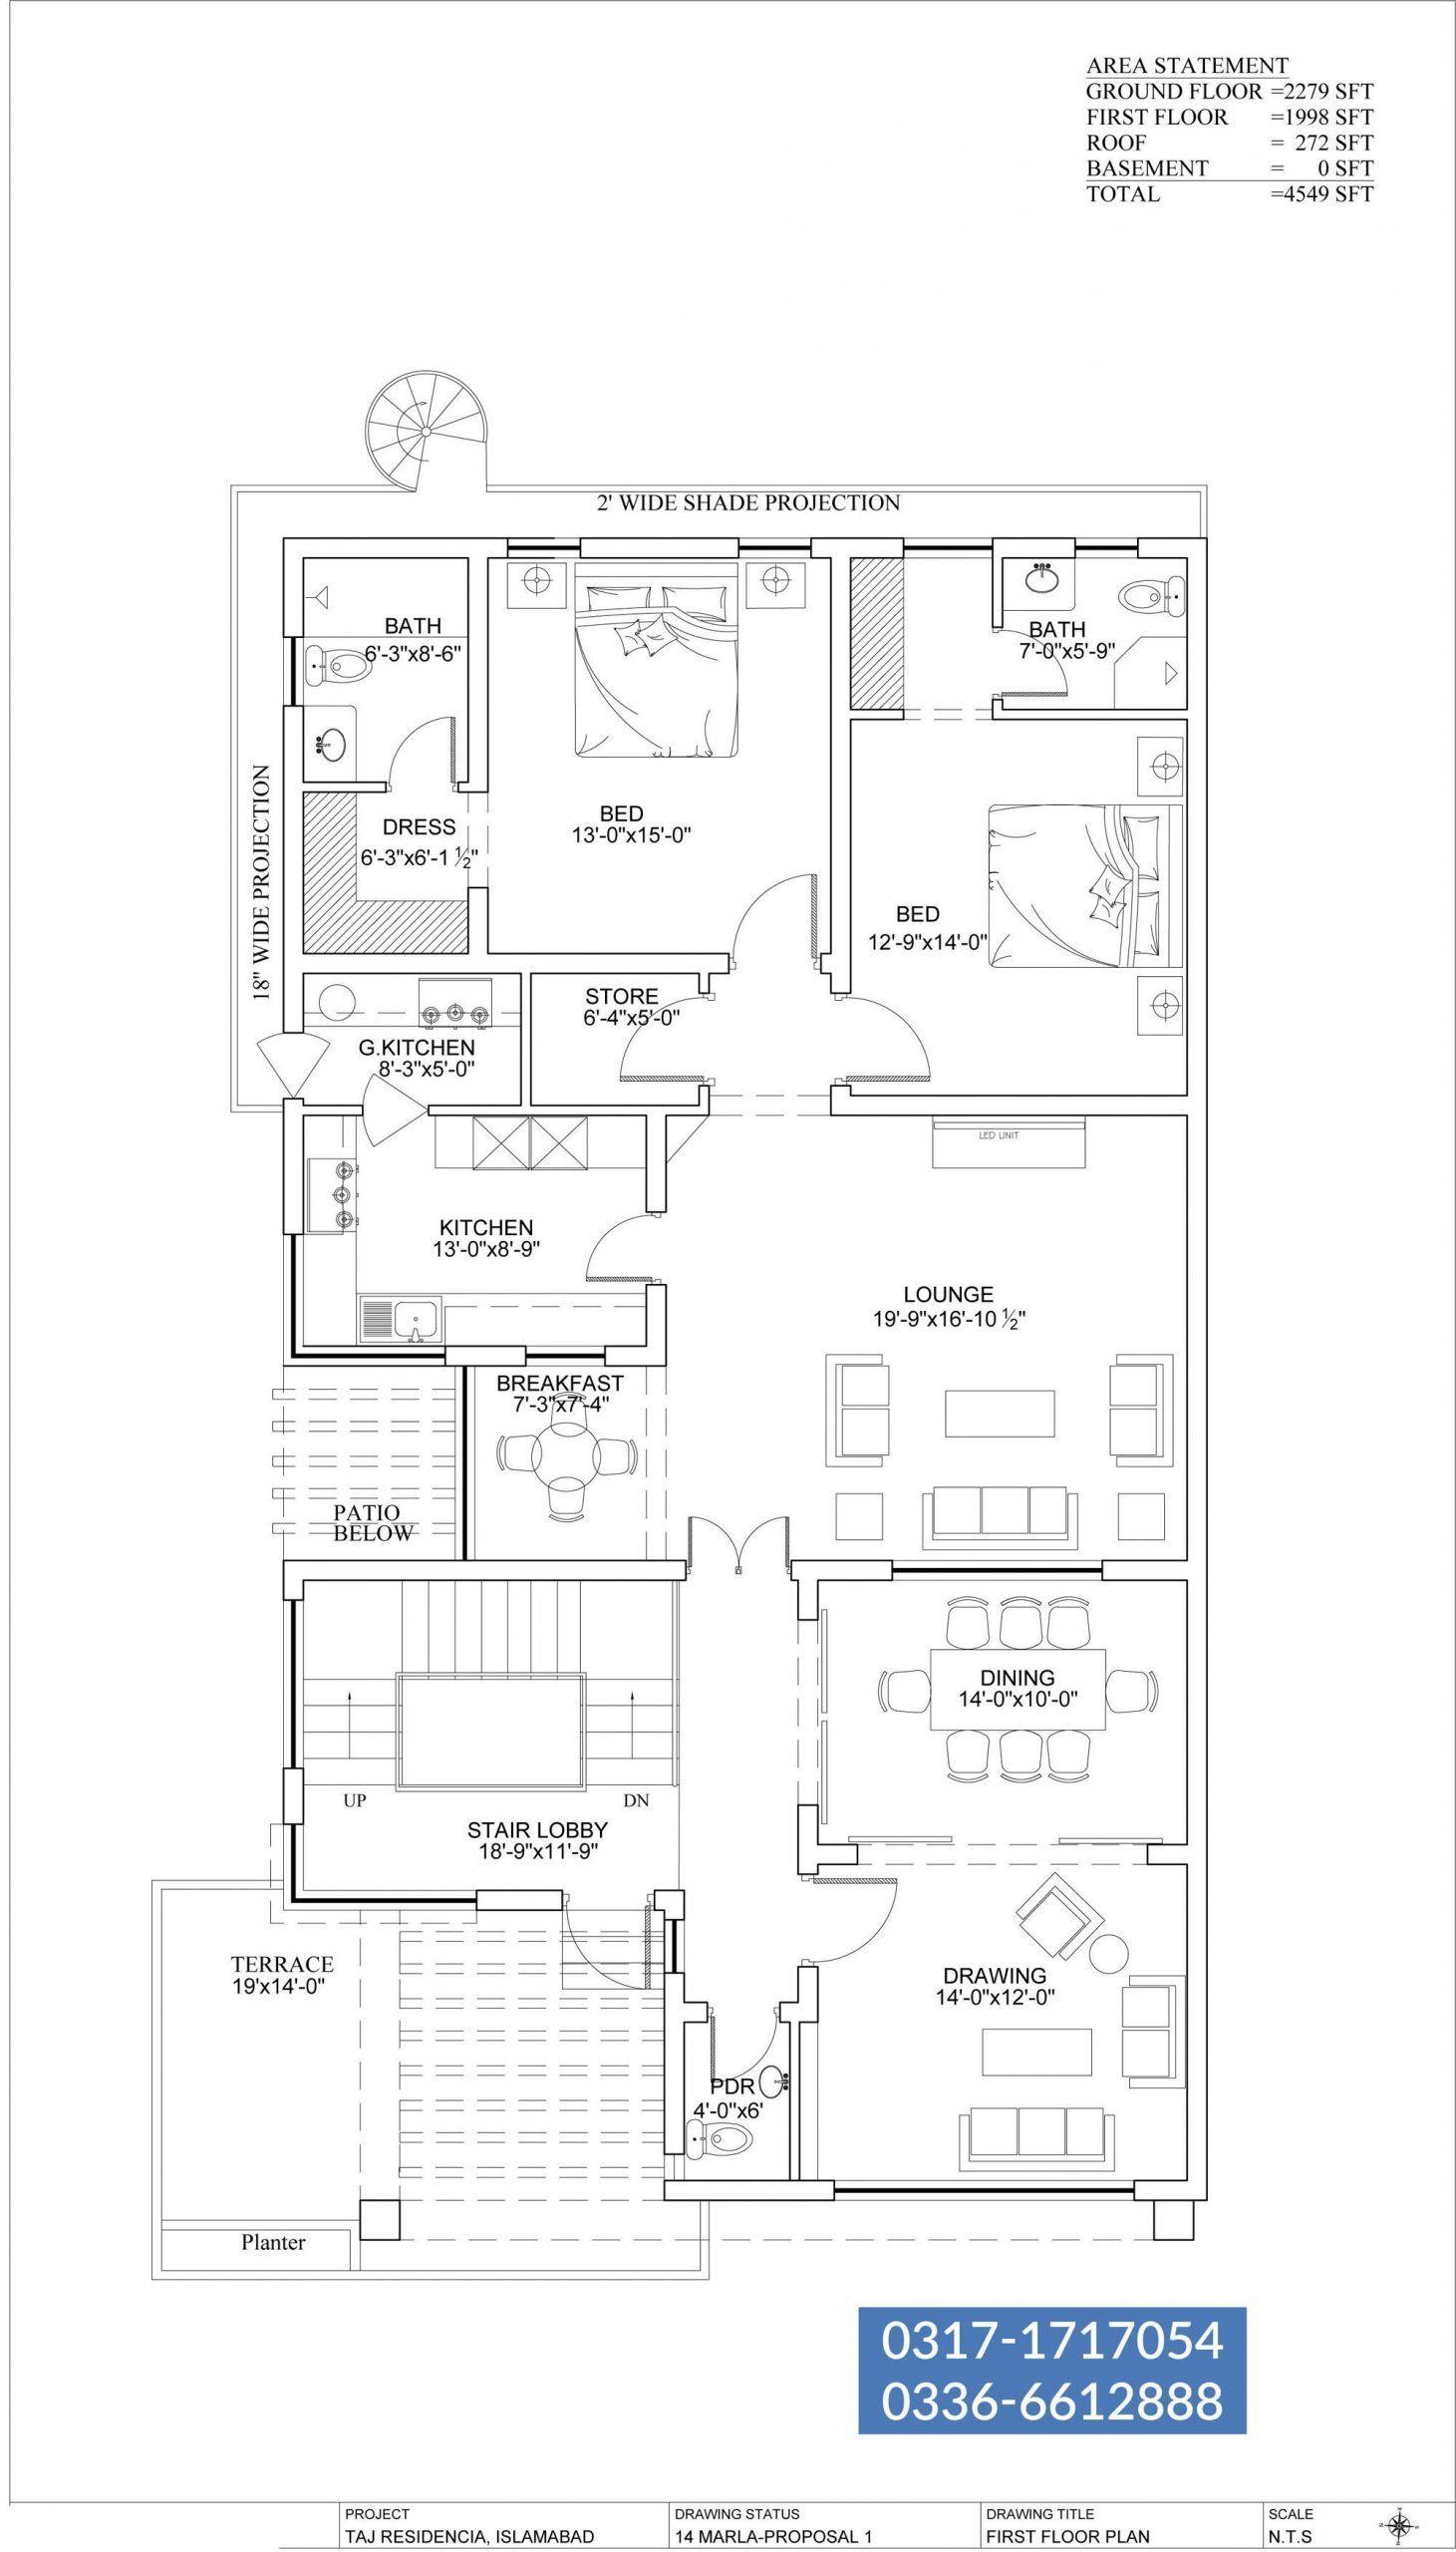 Modern House Plans Free Pdf Pin By Adeel Abbas On Adeel Abbas My House Plans Small House Design Plans Modern House Plans